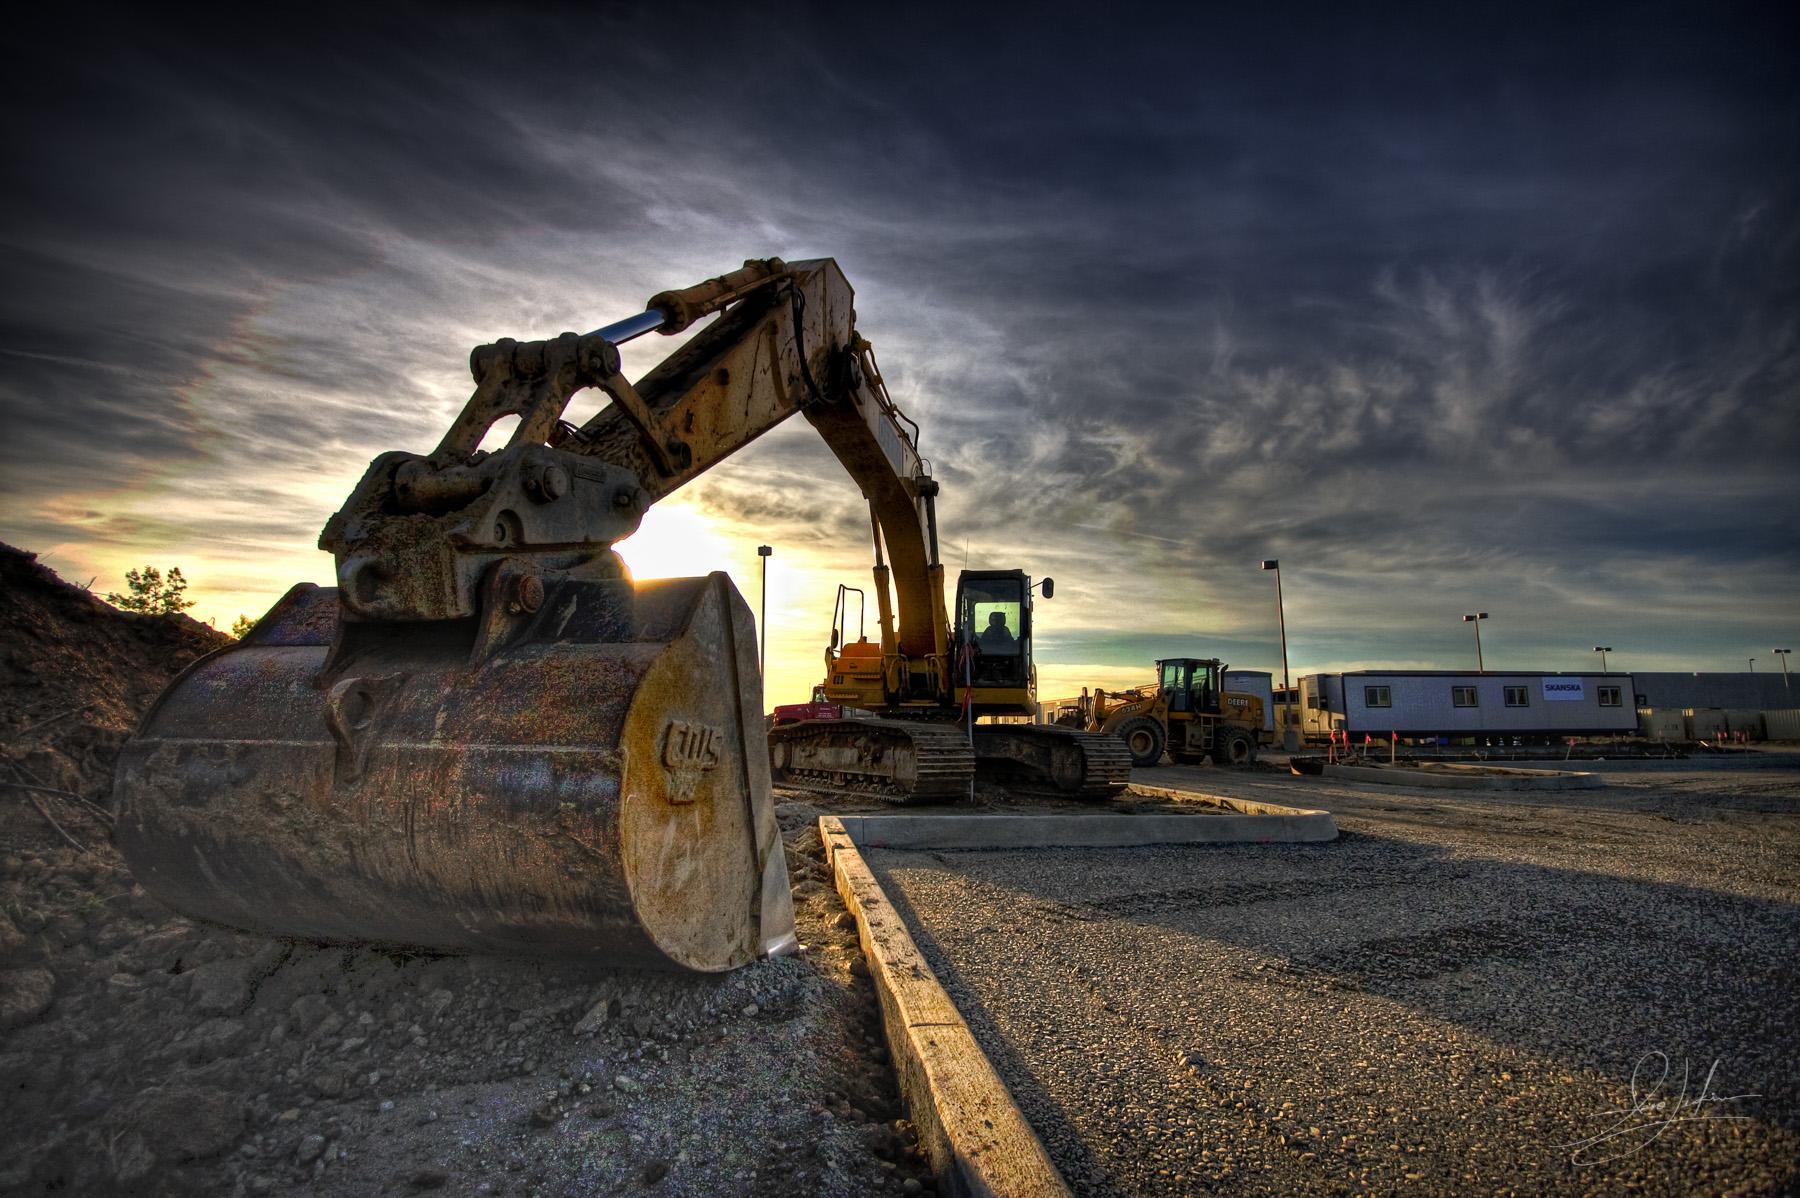 Construction equipment job site